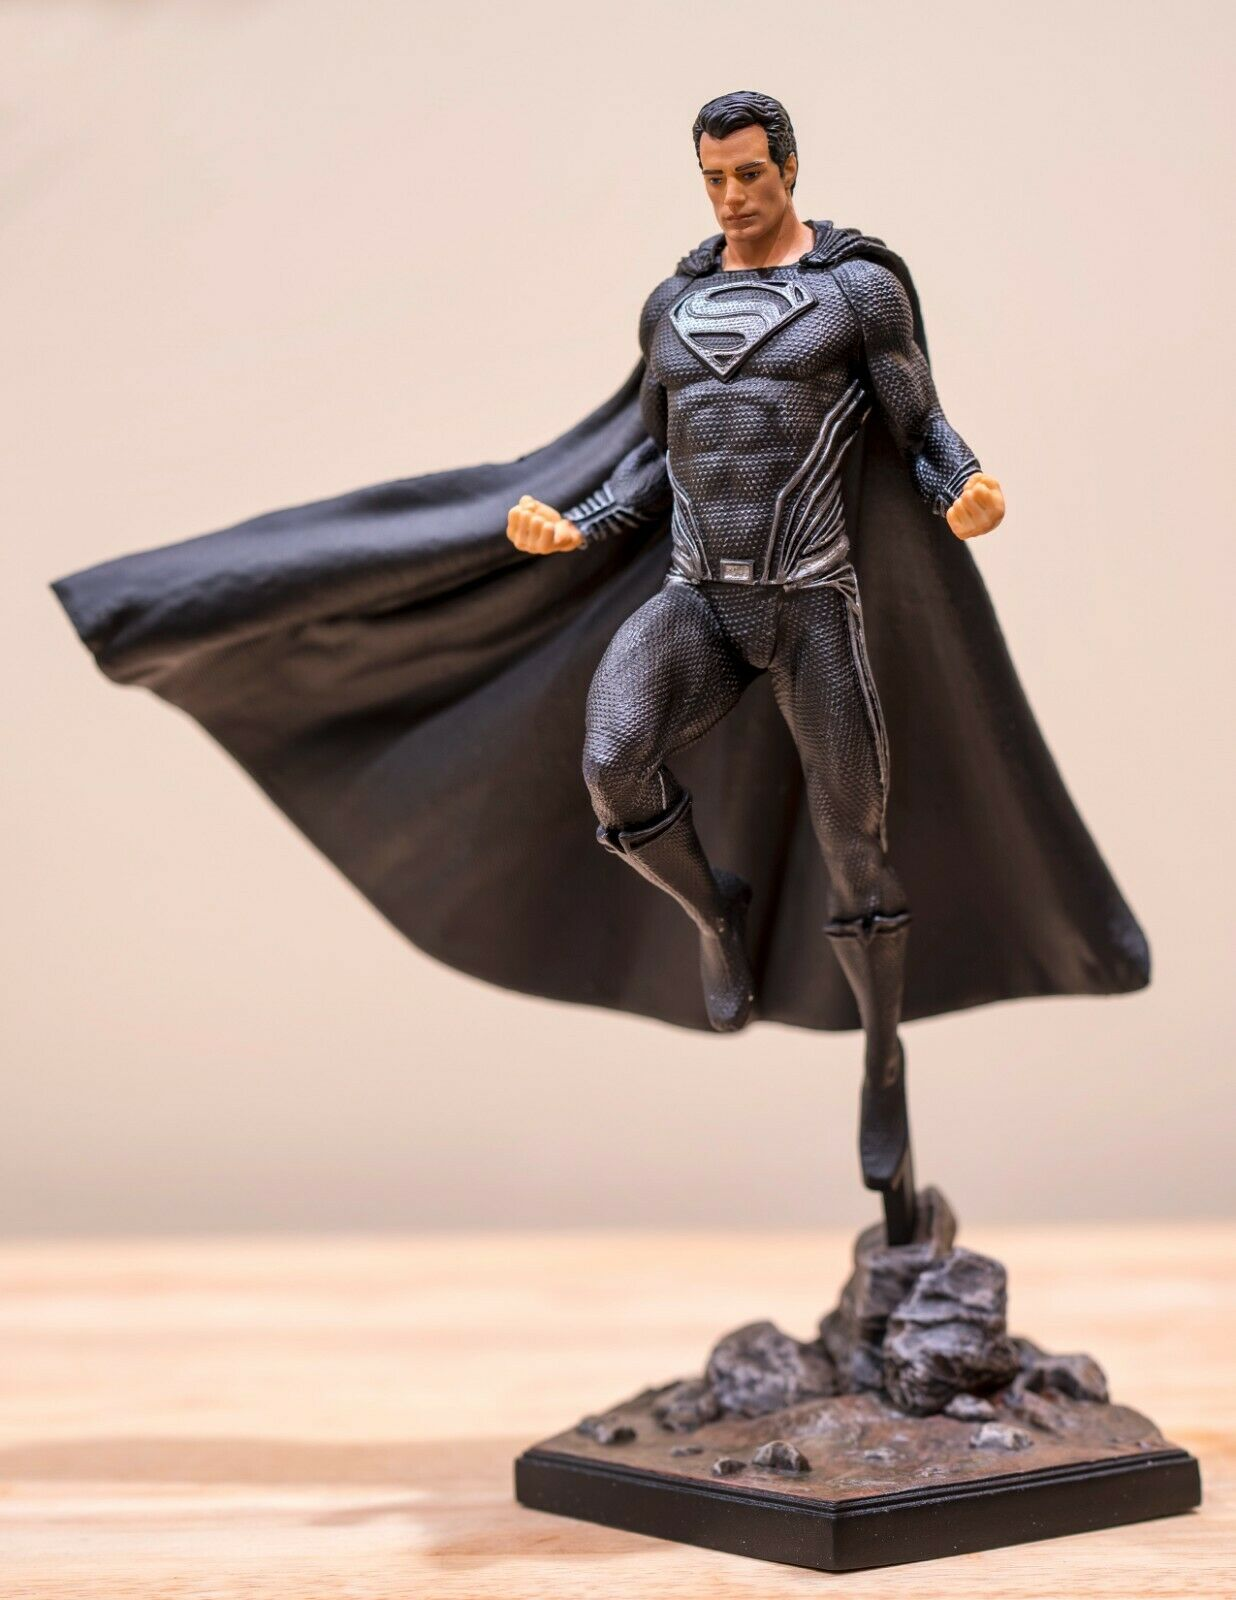 Custom Painted Iron Studios Black Suit Superman Justice League PVC Statue Figure on eBay thumbnail